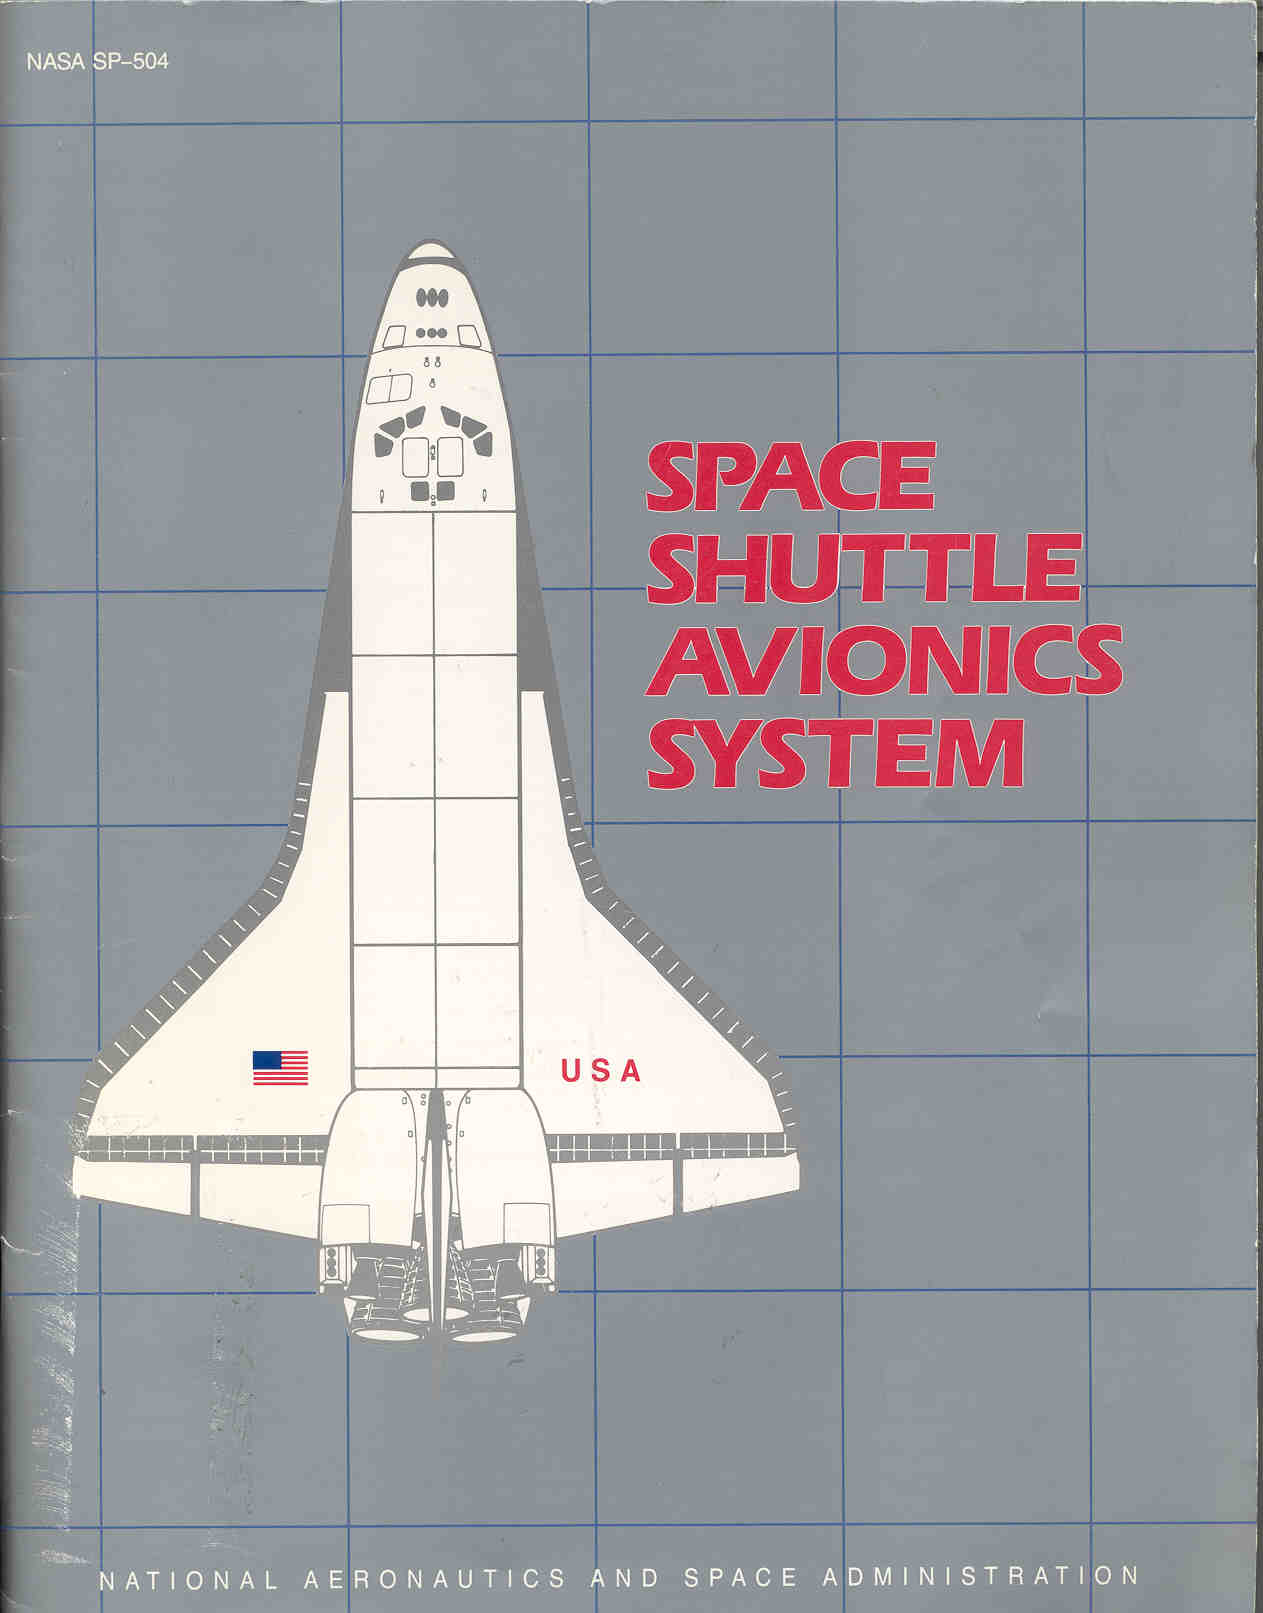 SP-504: Space Shuttle Avionics System